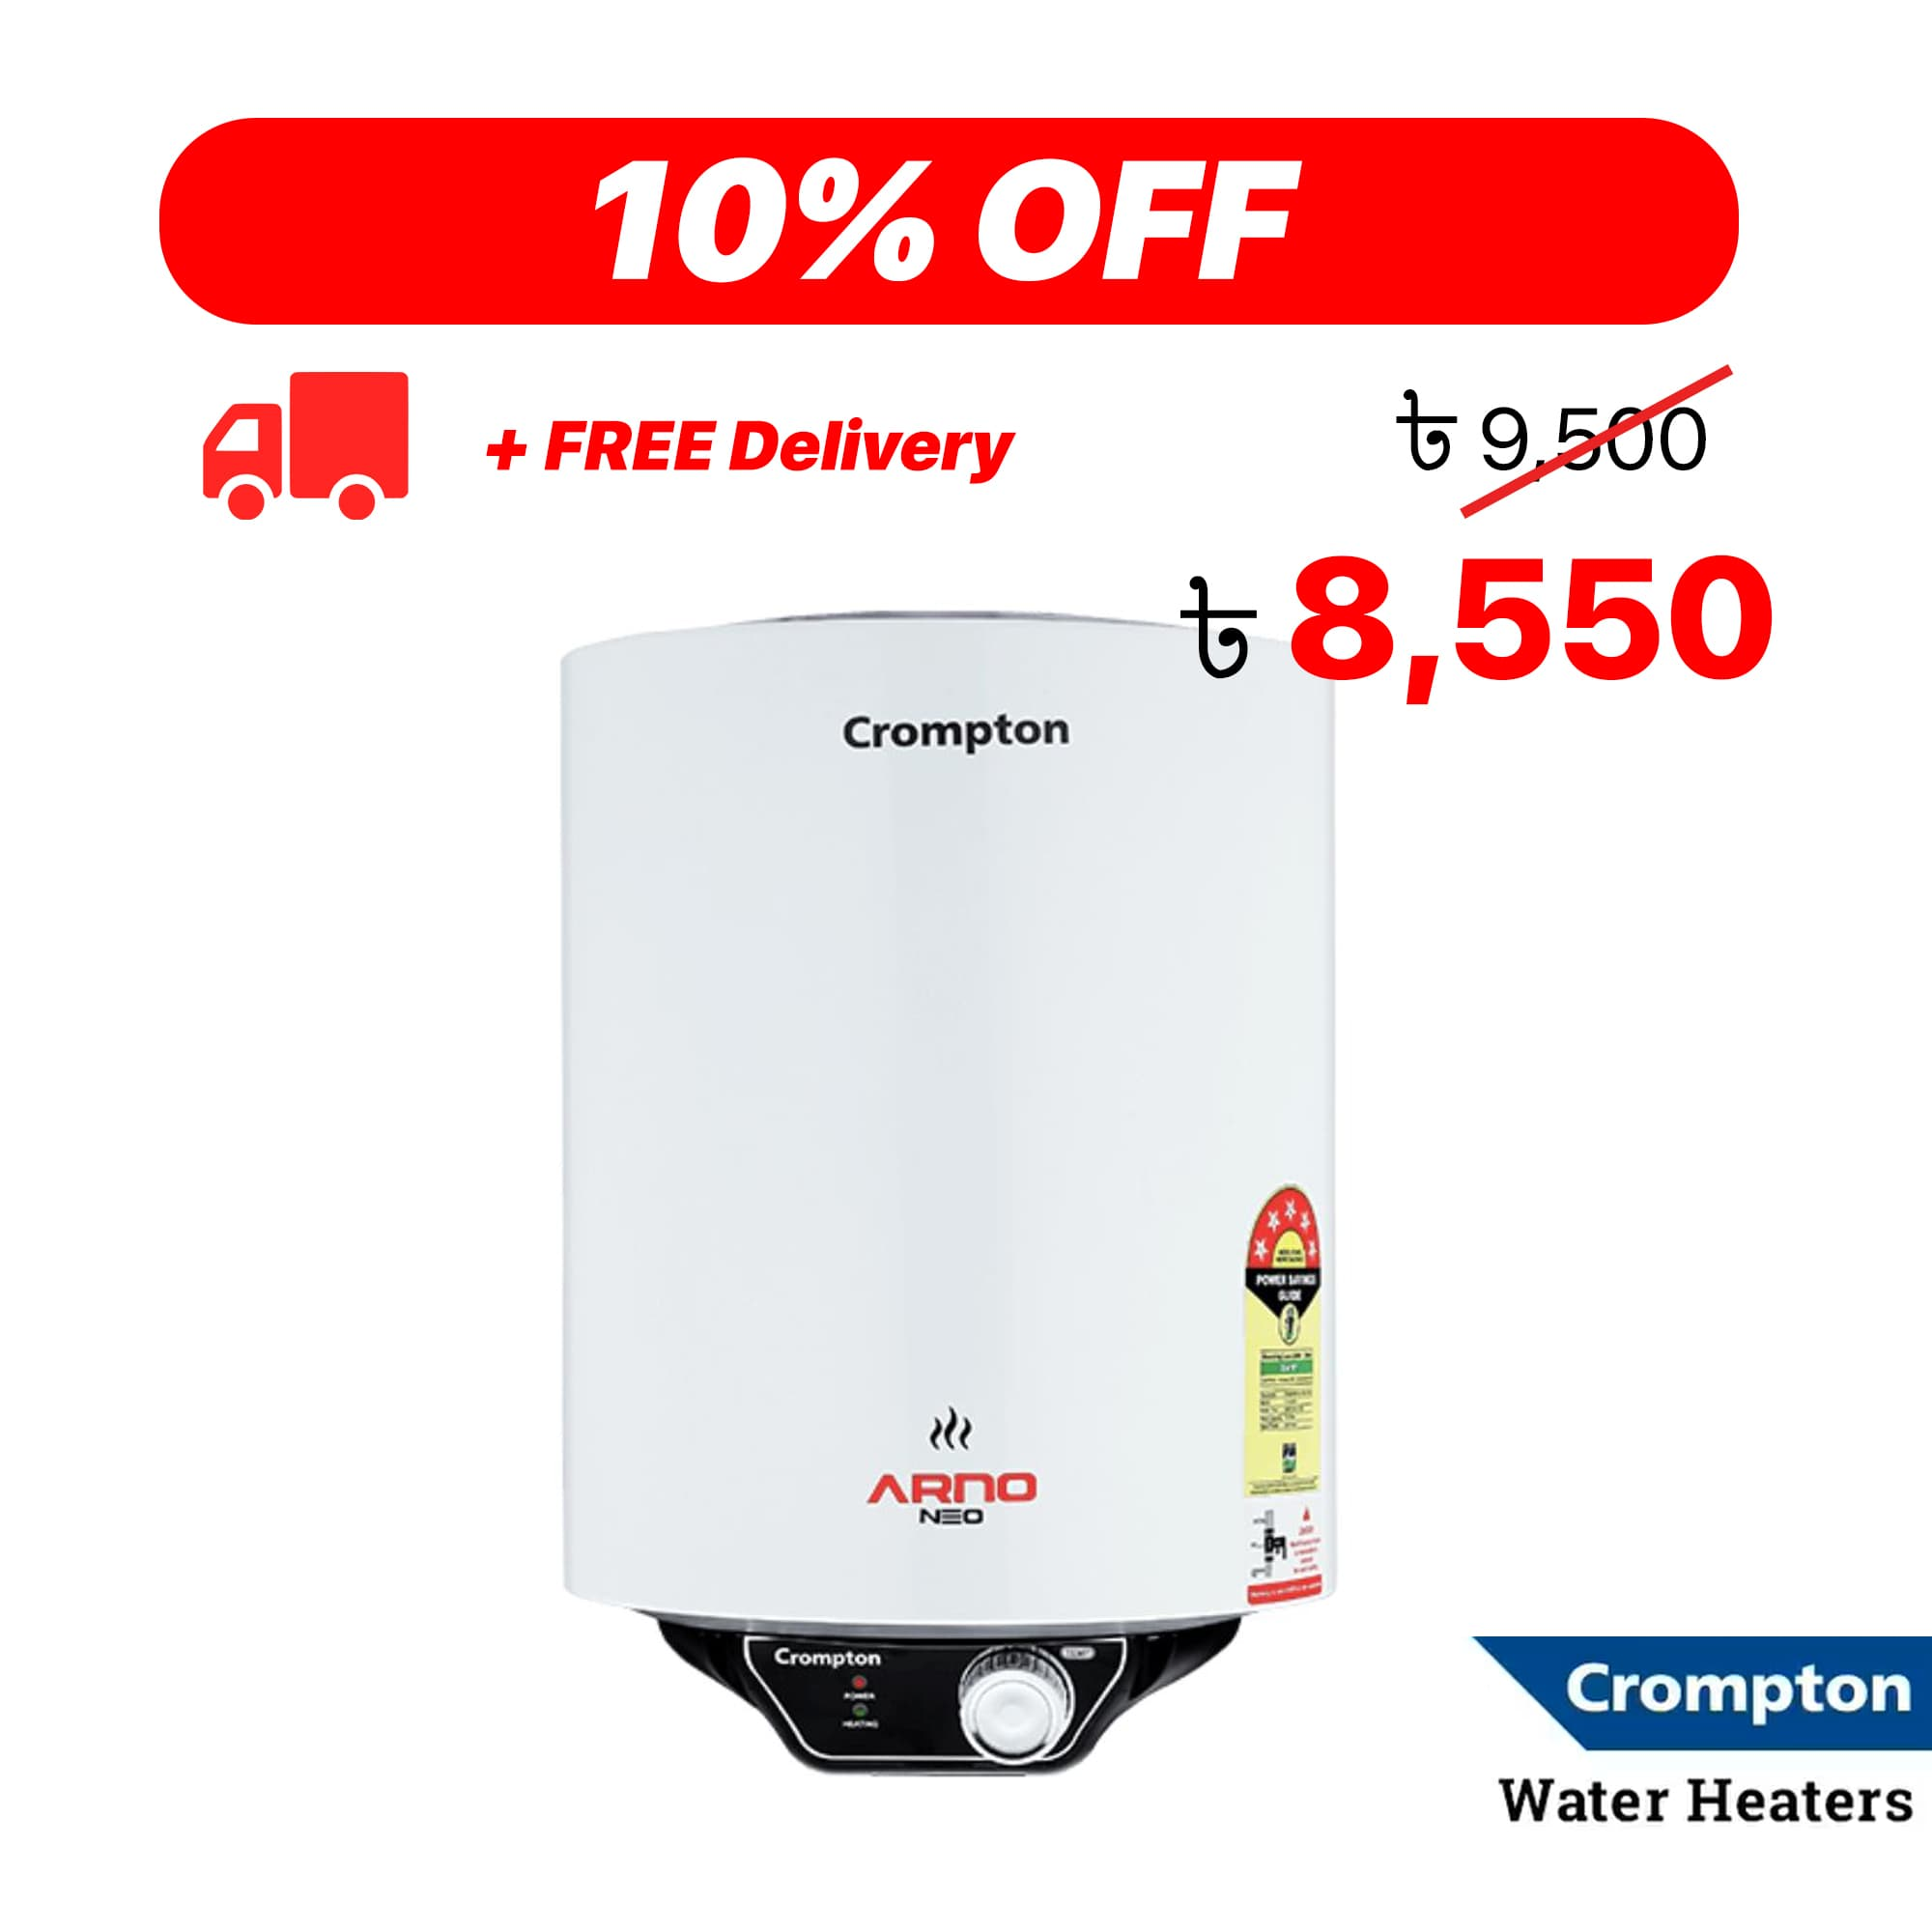 Crompton Arno Neo – Water Heater Promotion in Bangladesh